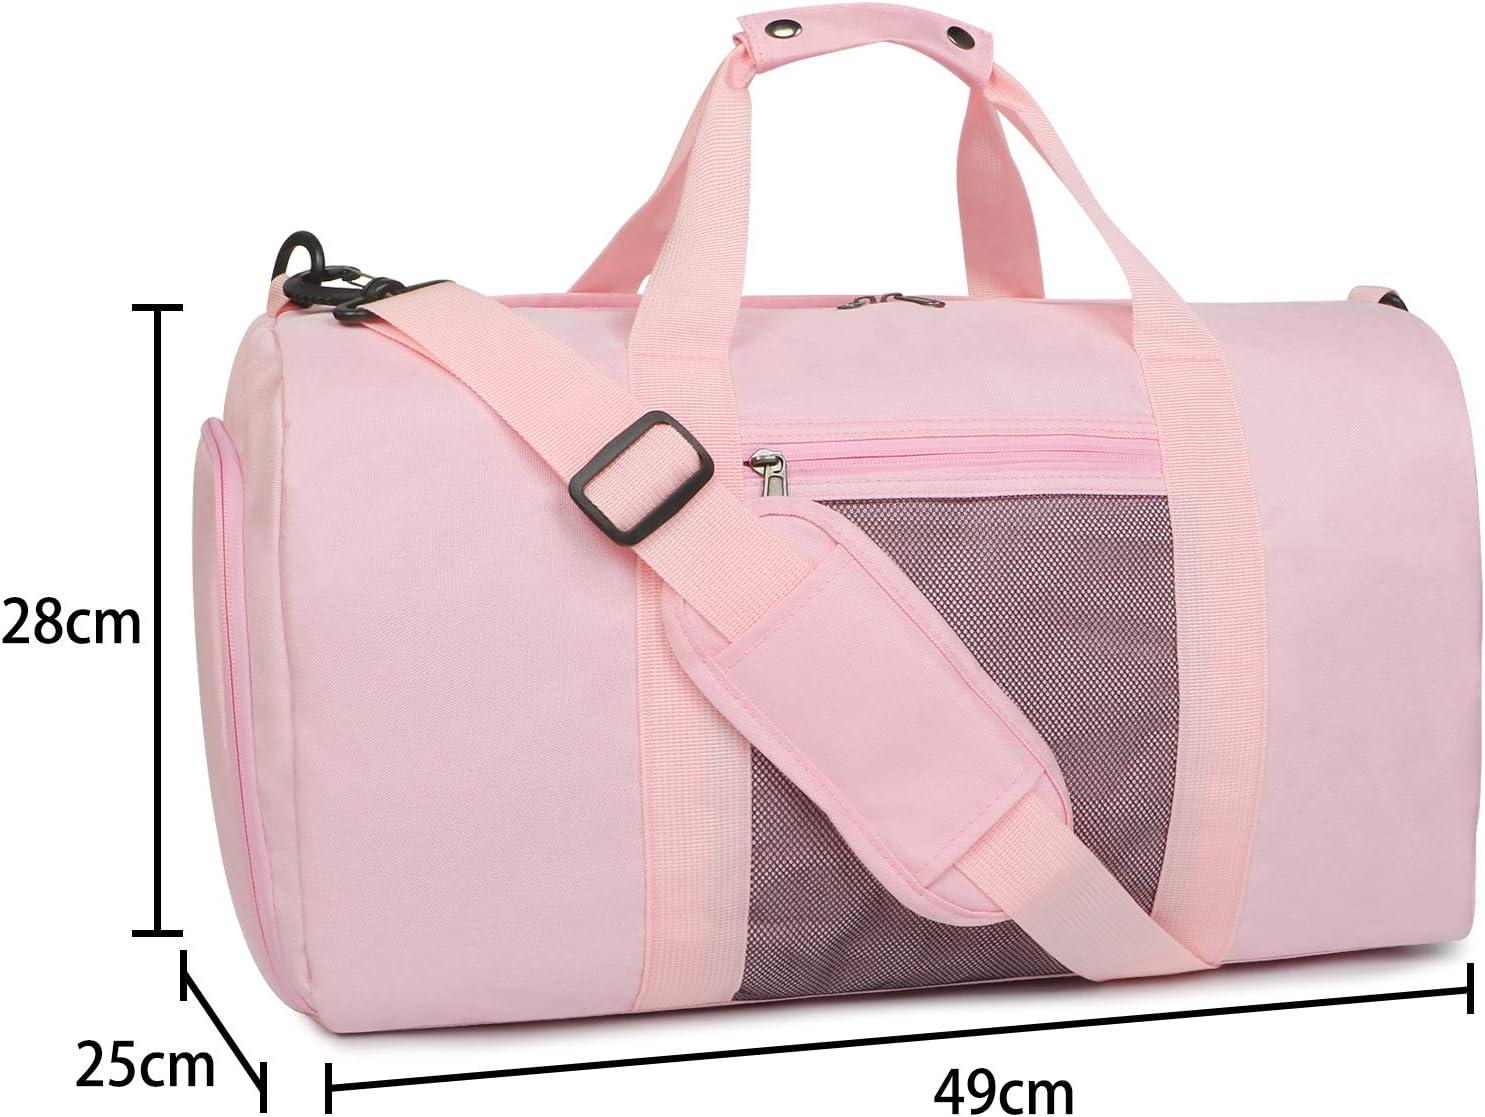 Sports Gym Bag Oflamn Bolsa de Viaje Bolsa Fin de Semana 1.0 Negro Bolsa de Deporte con Compartimento Zapatos para Mujeres y Hombres